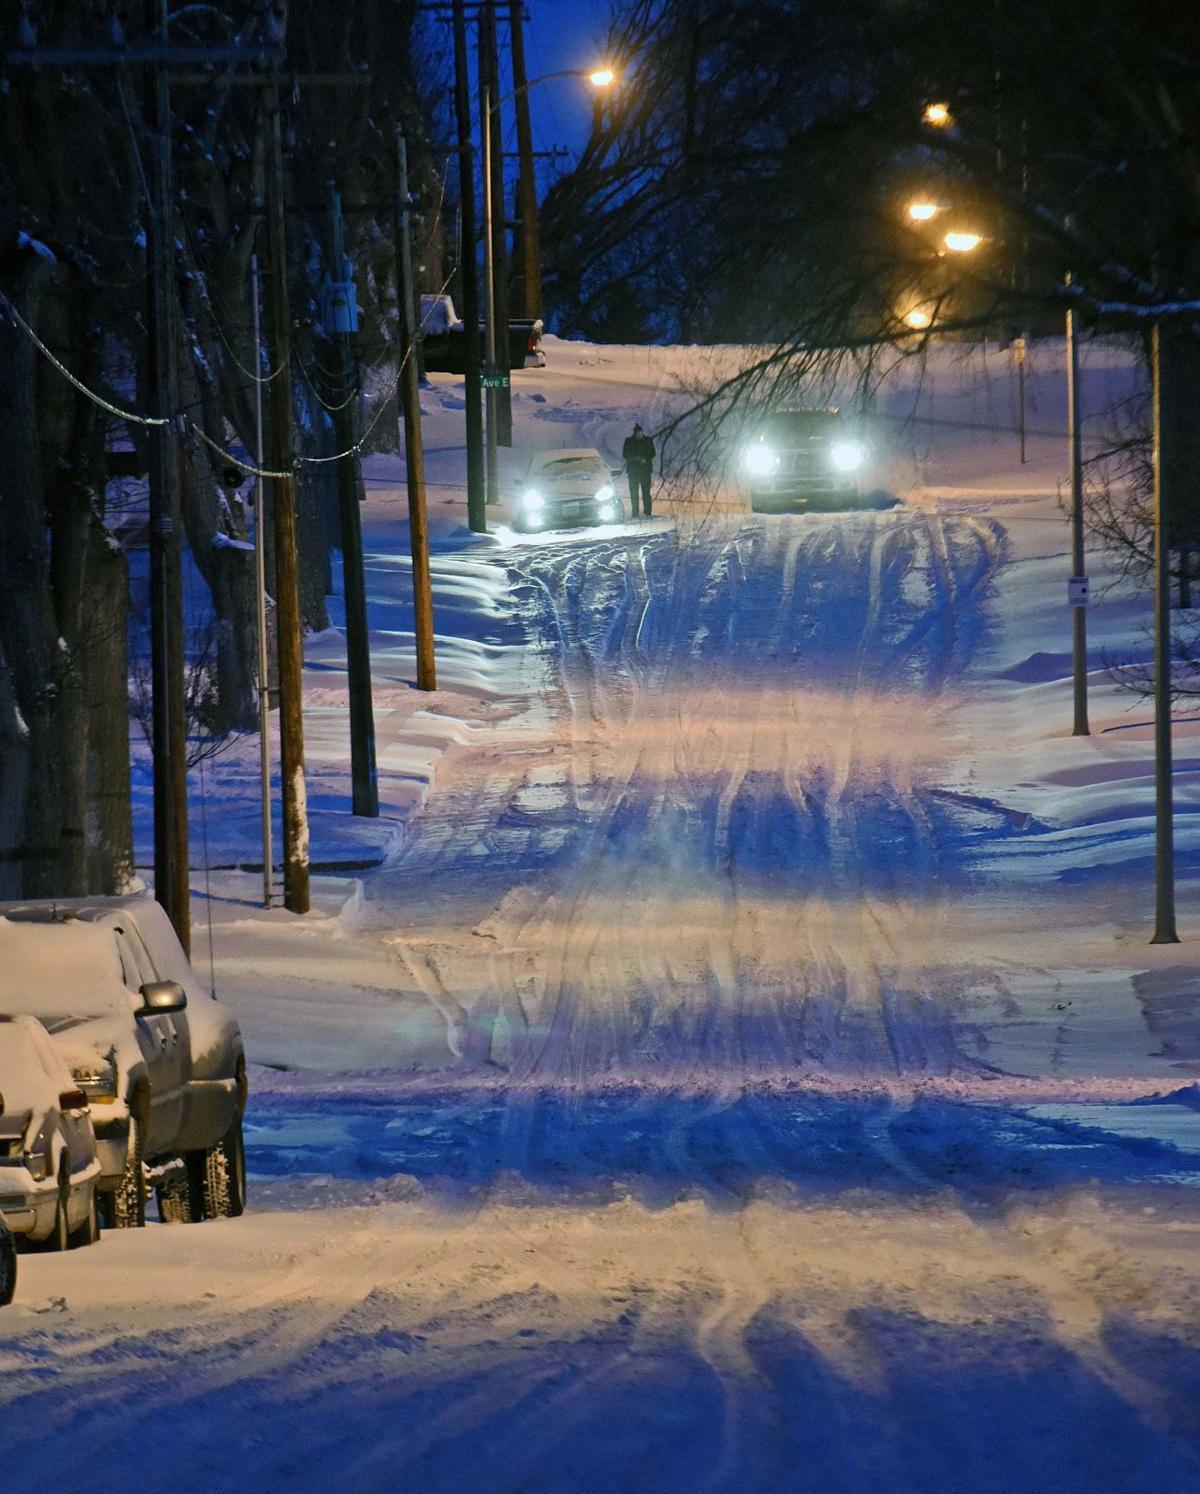 011218-nws-snow1.jpg